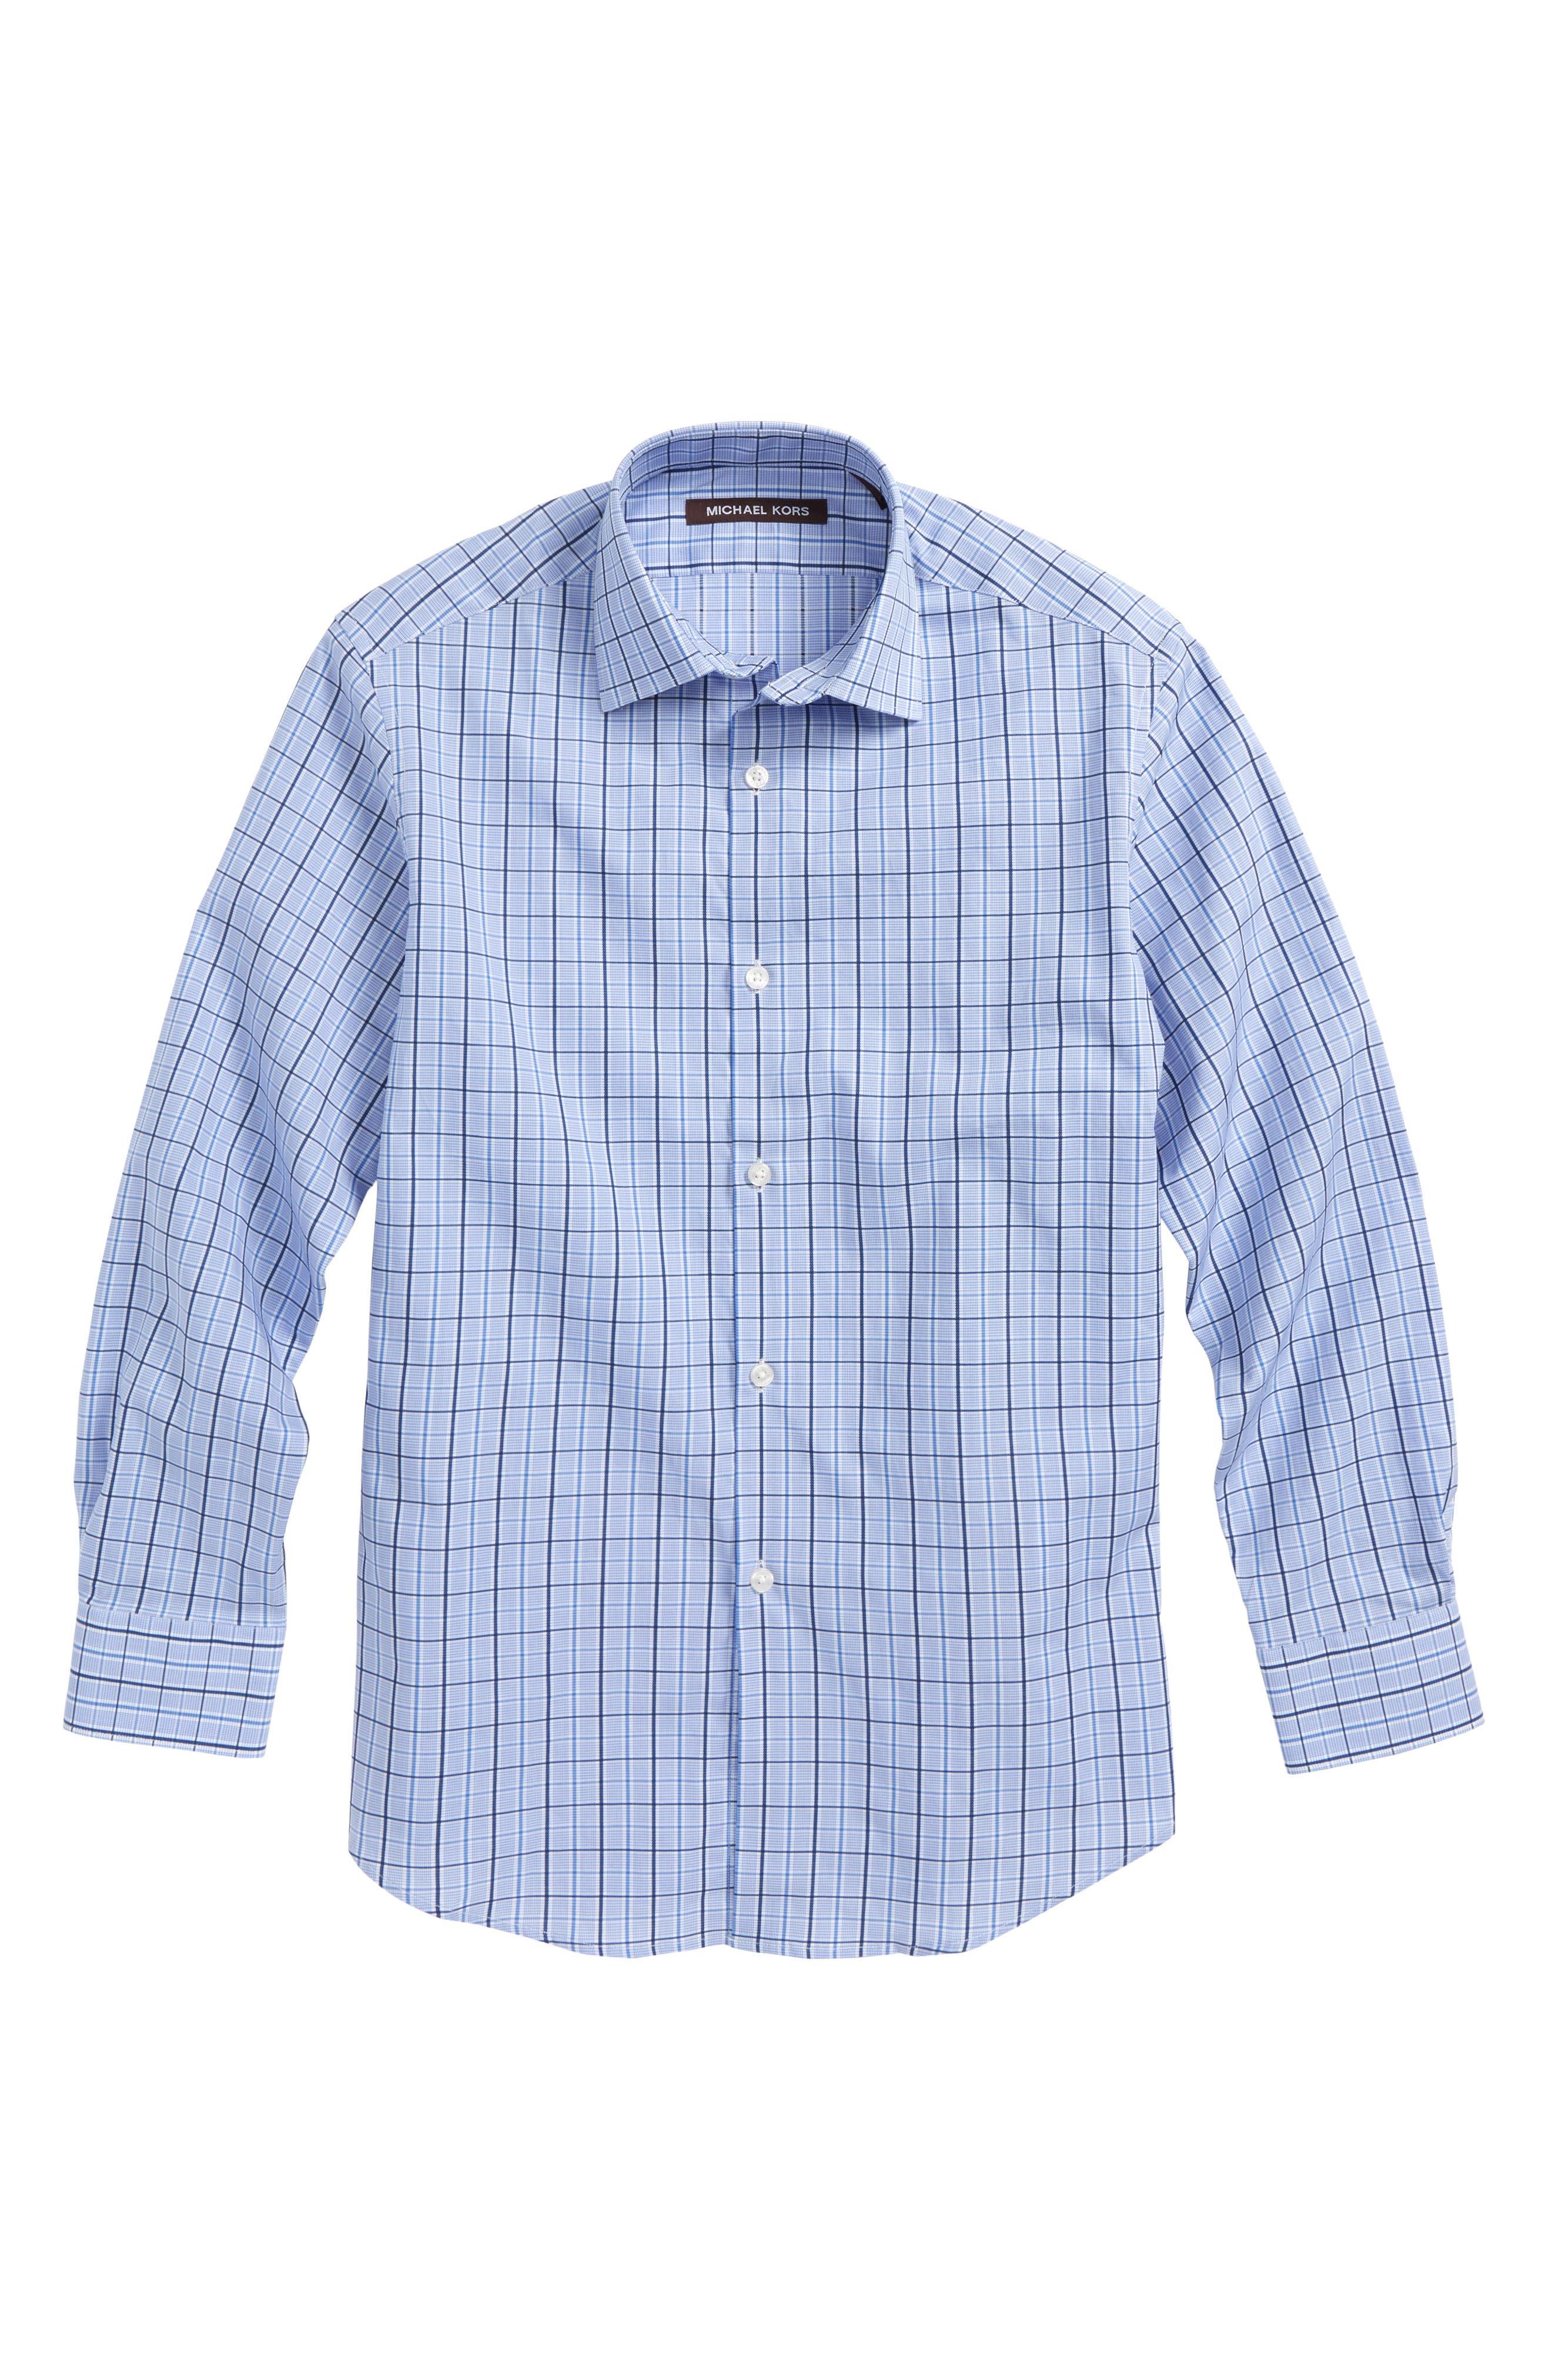 Plaid Dress Shirt,                         Main,                         color, Blue/ White